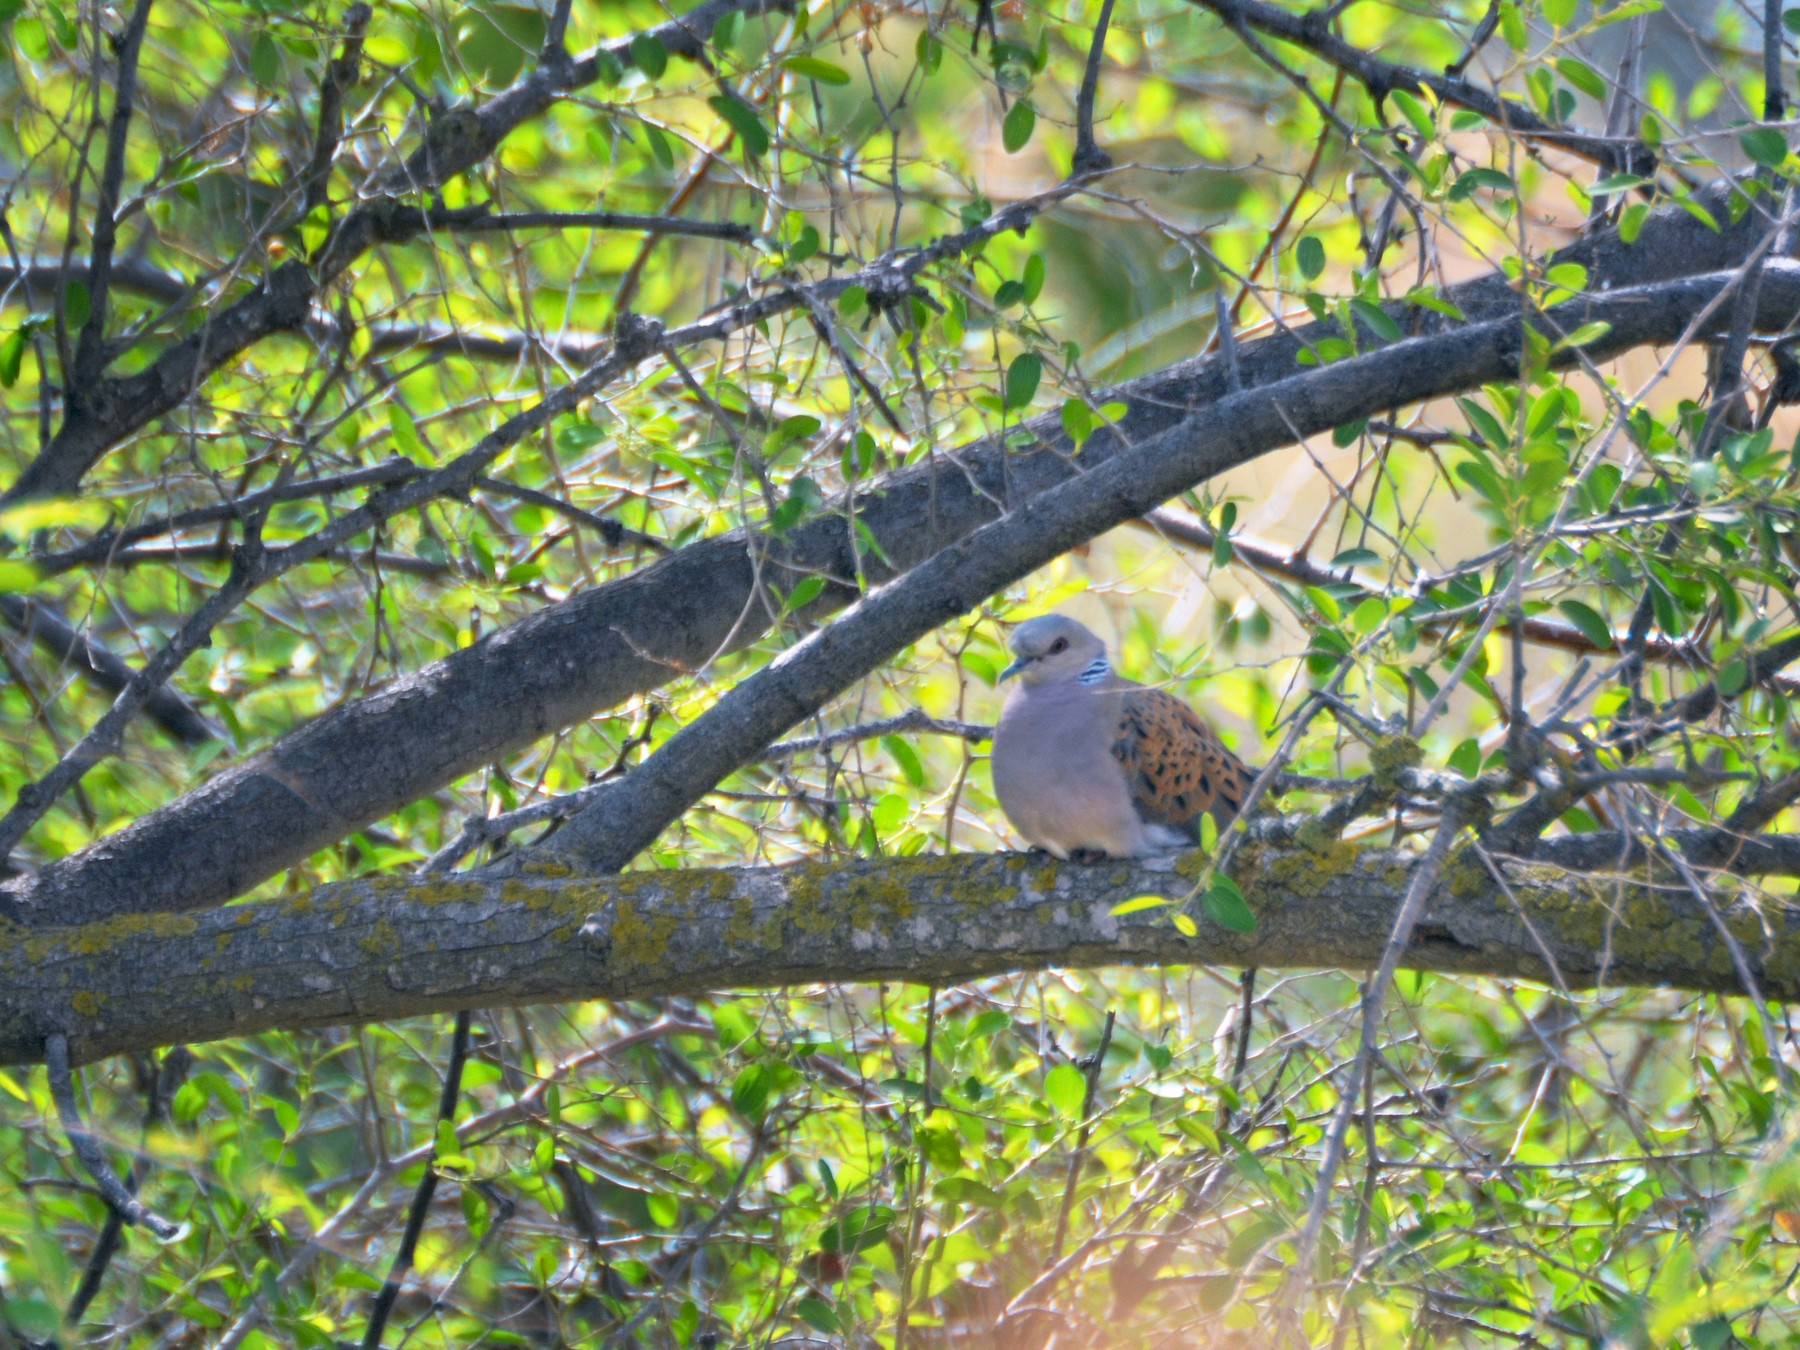 European Turtle-Dove - Jerome-Yehuda Schwartz